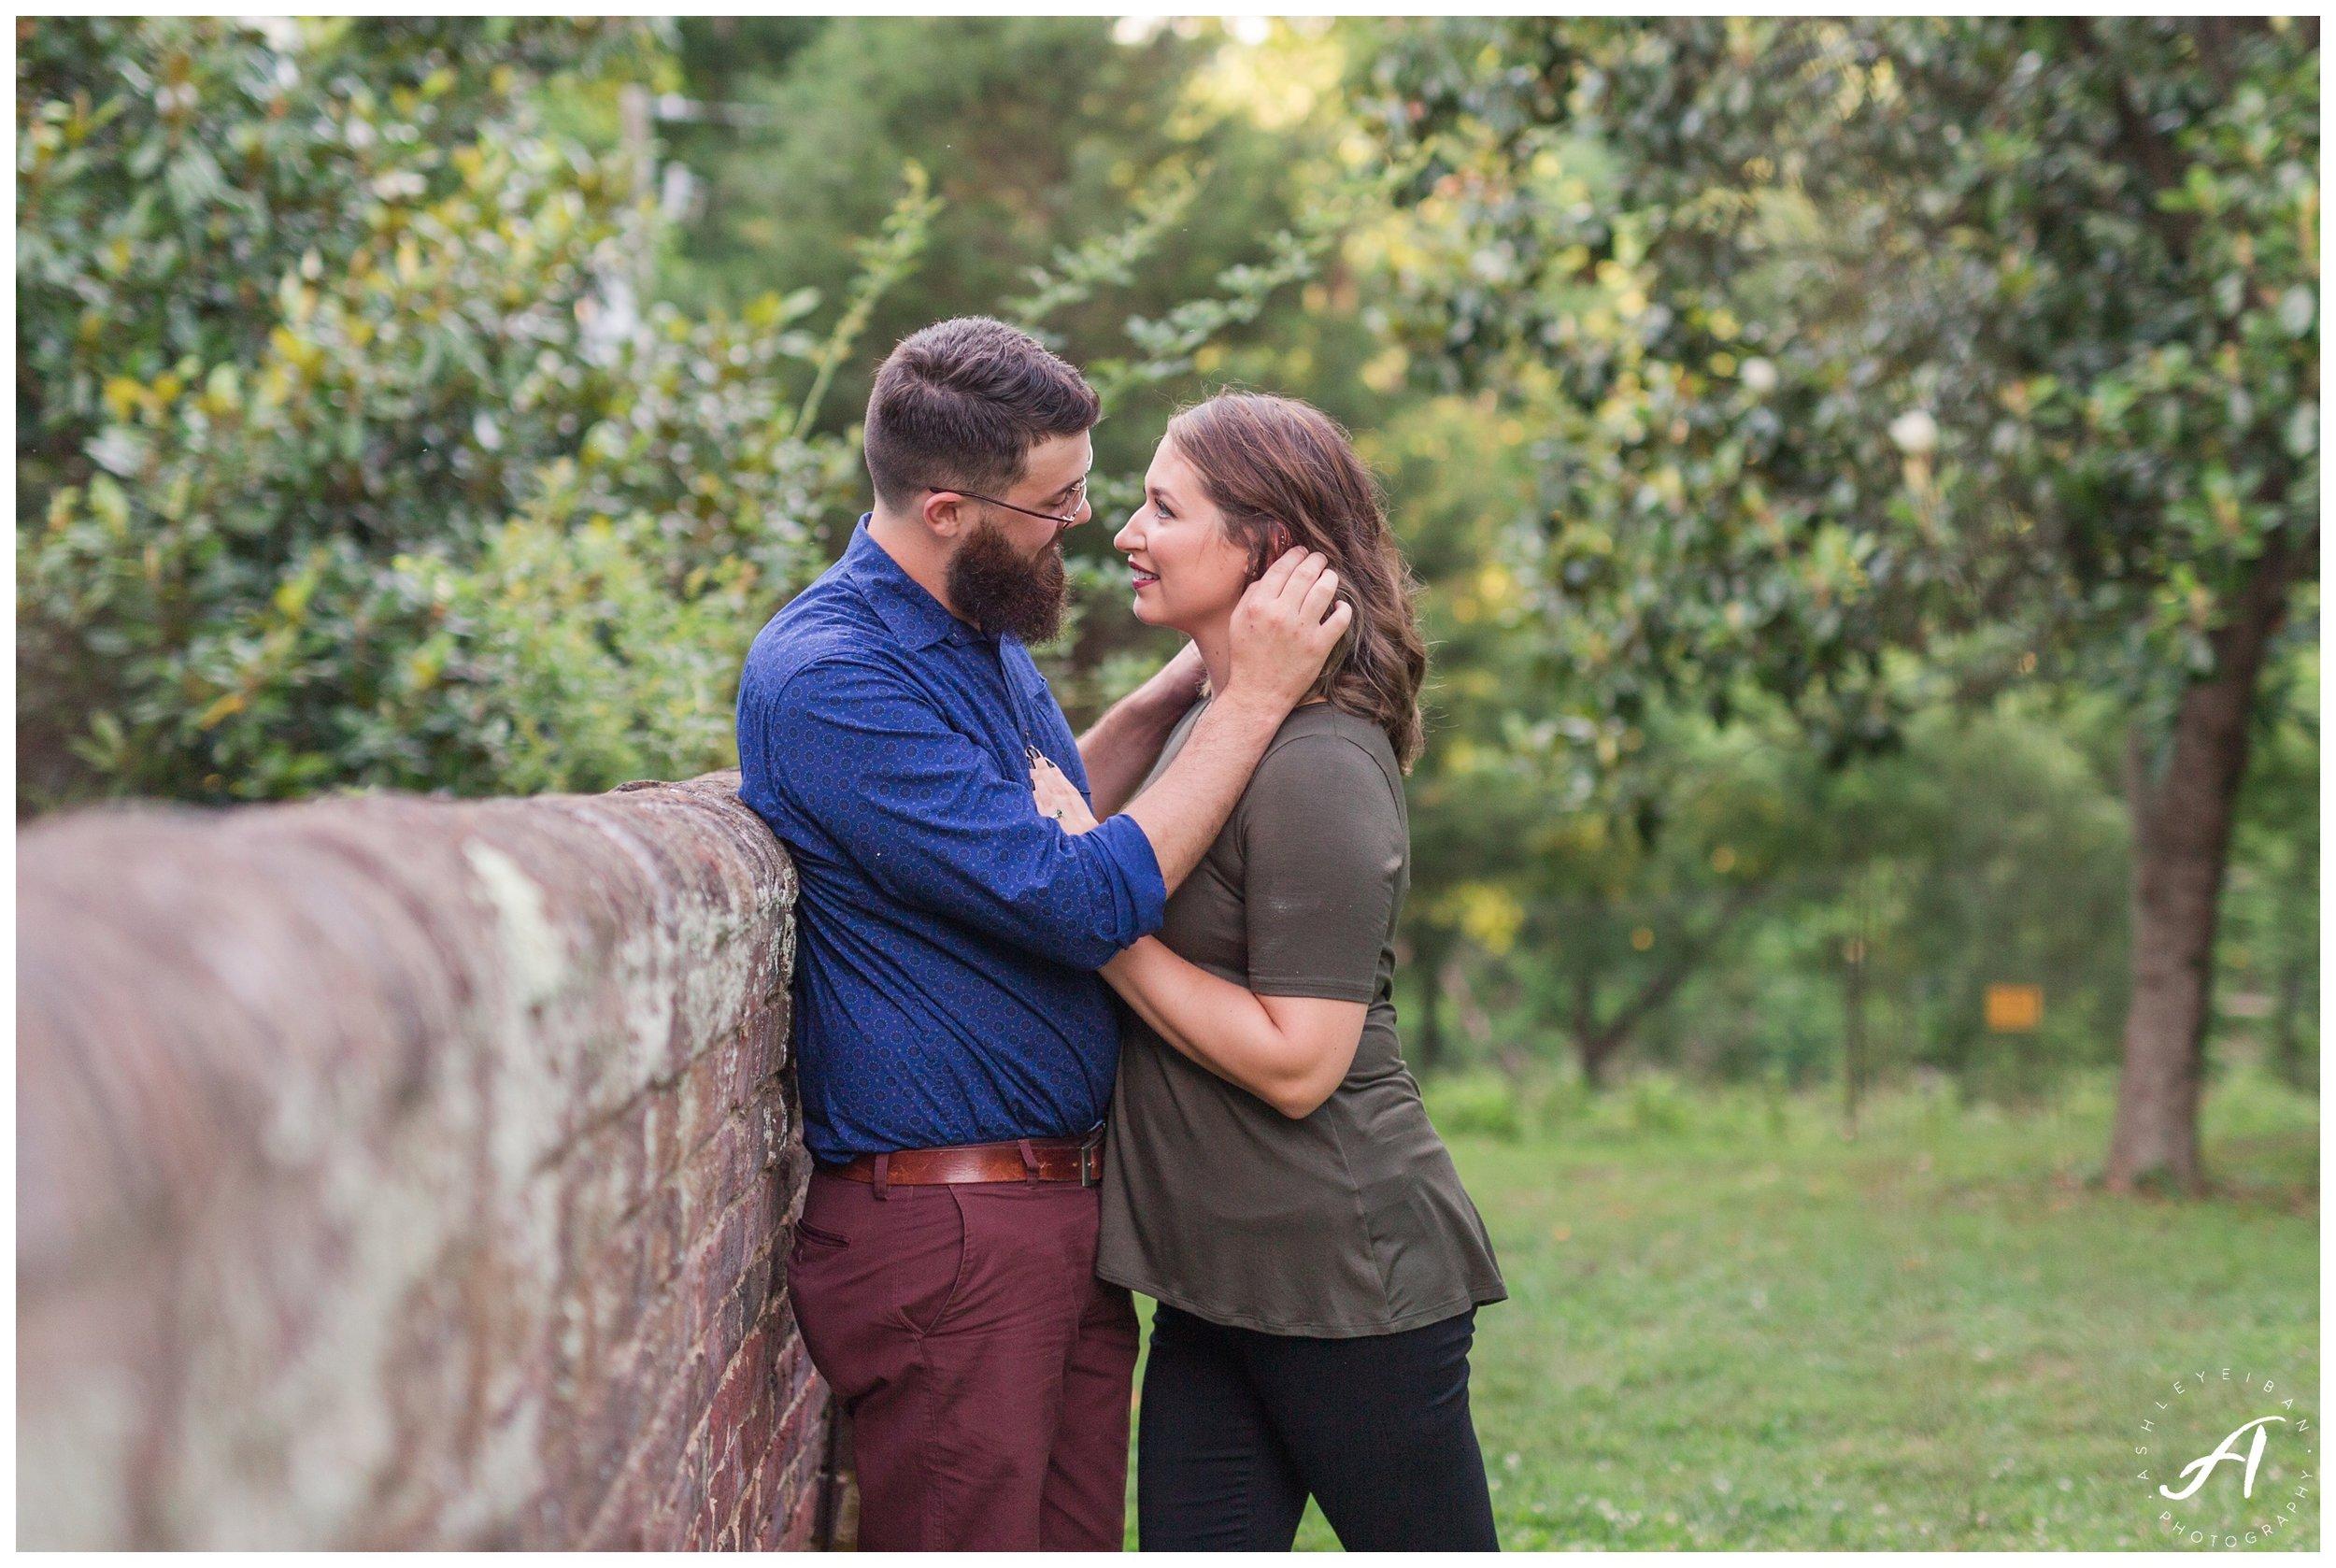 Lynchburg Virginia Wedding and Engagement Photographer || Ashley Eiban Photography || www.ashleyeiban.com